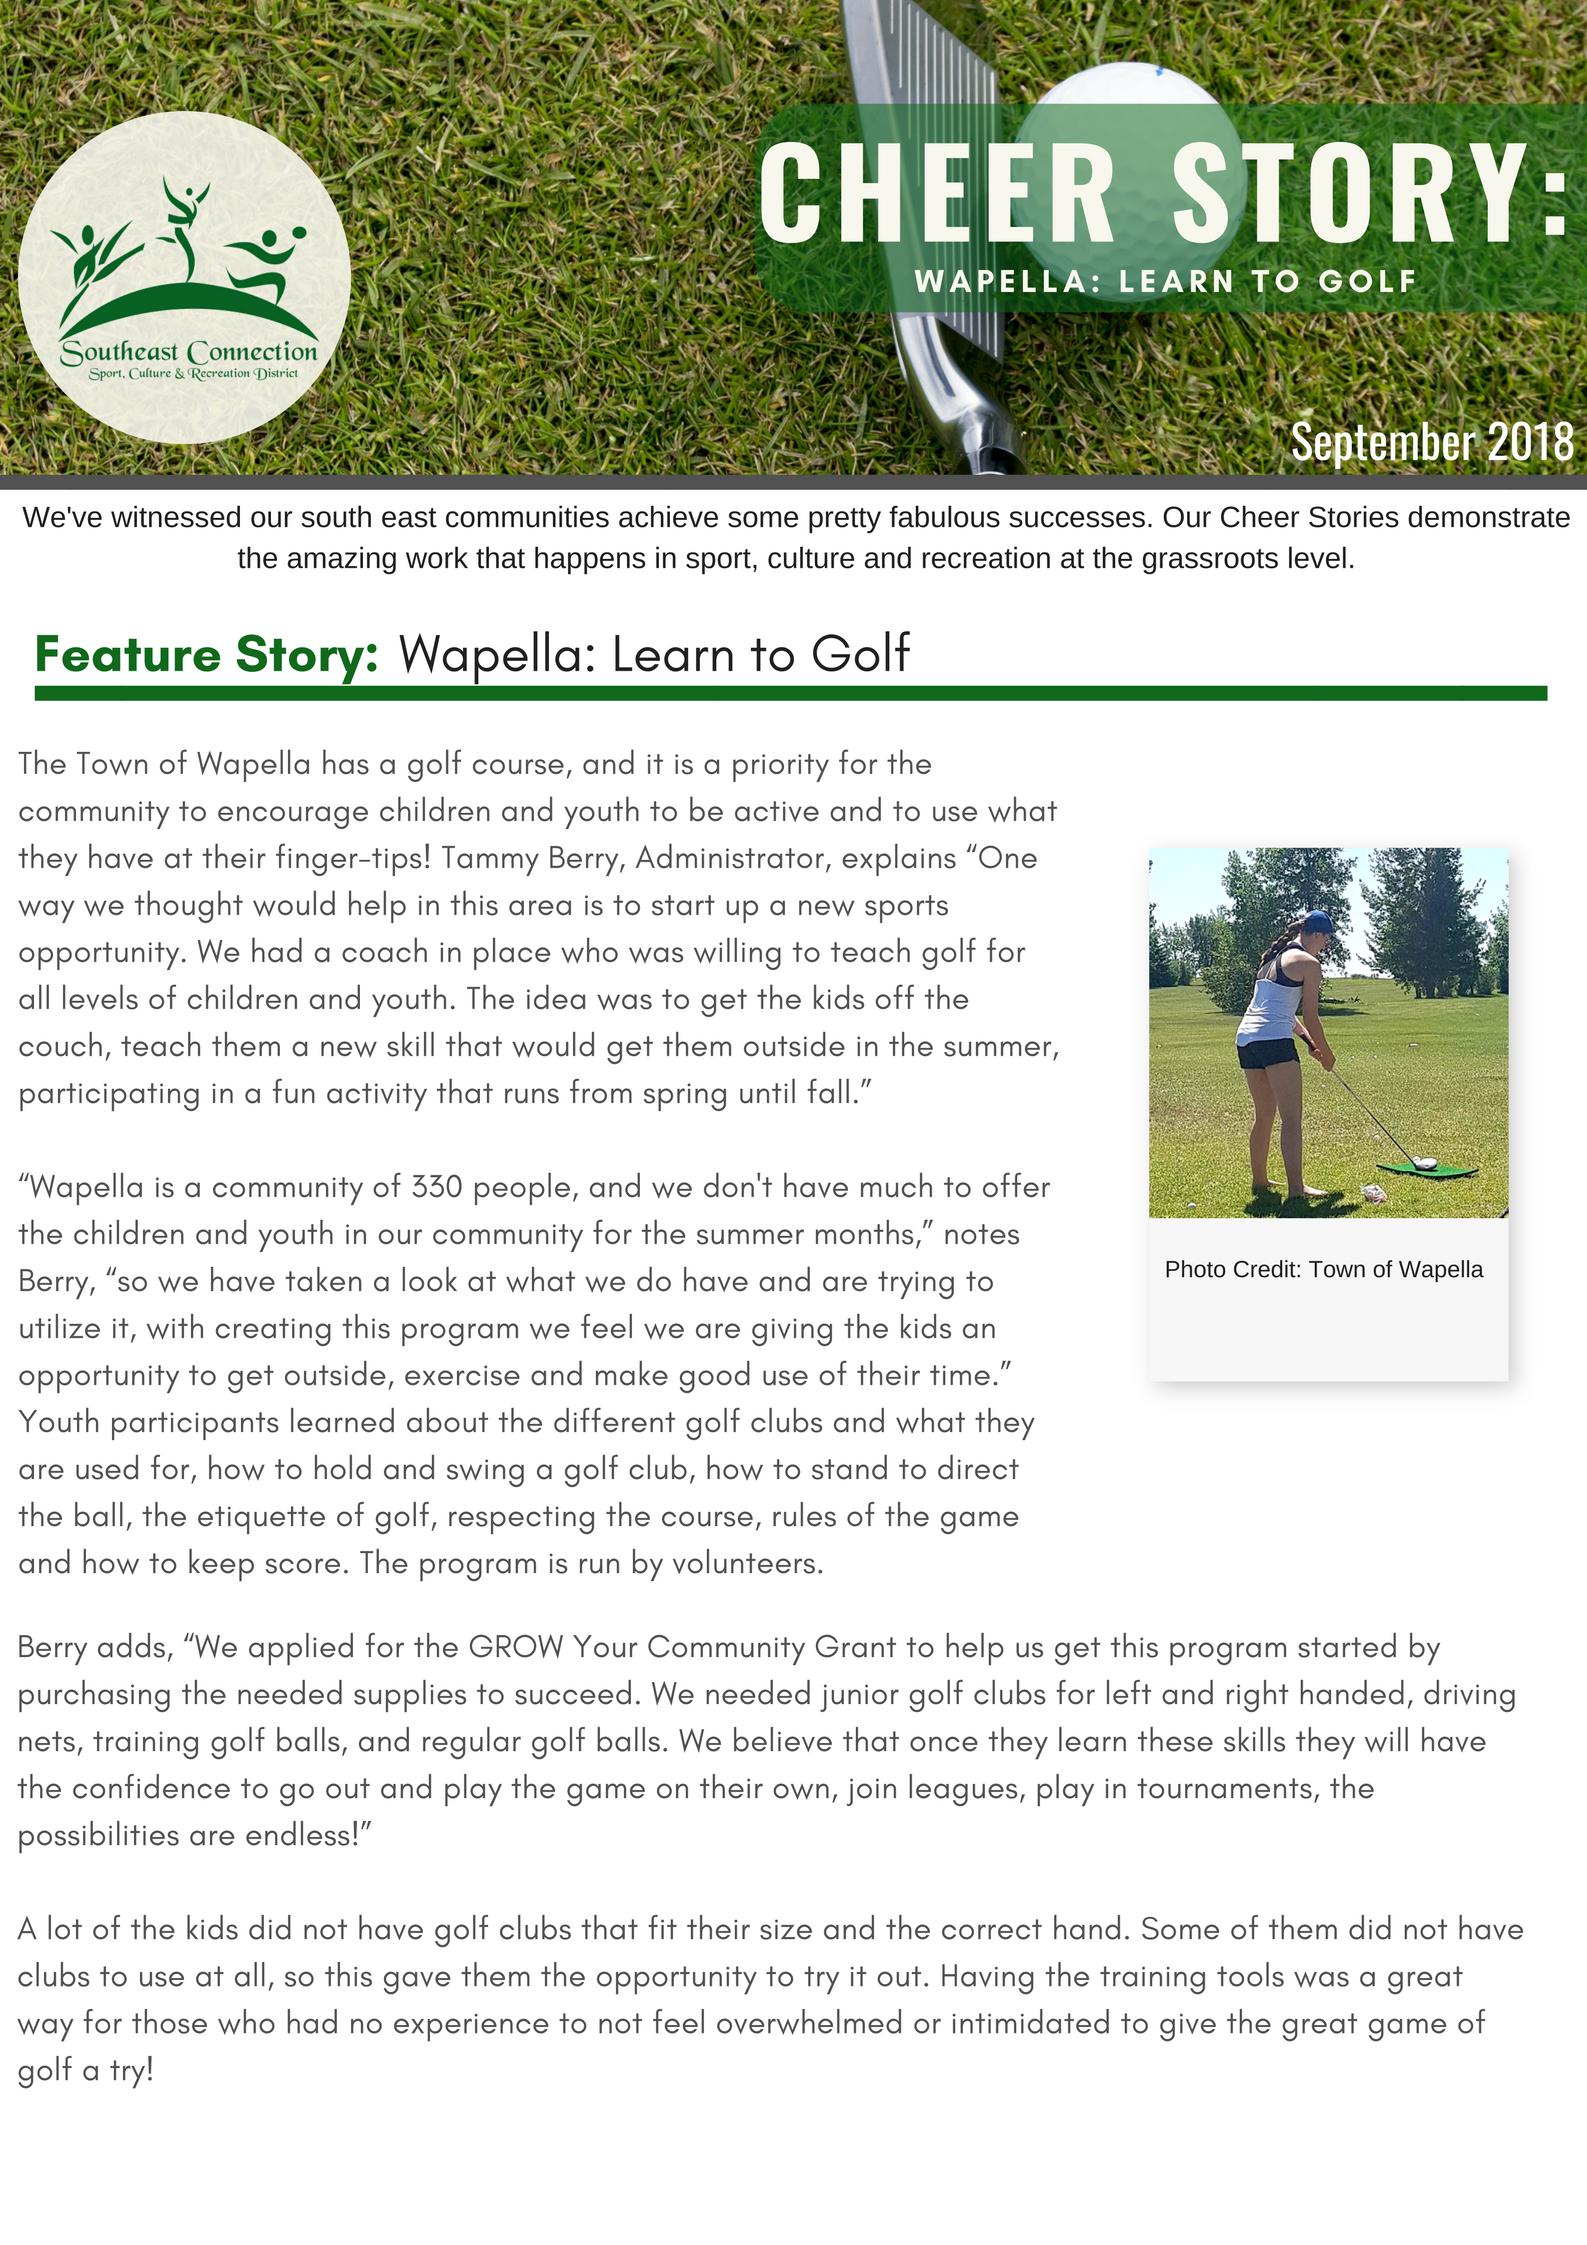 Cheer Story: Wapella Learn to Golf - Image 1